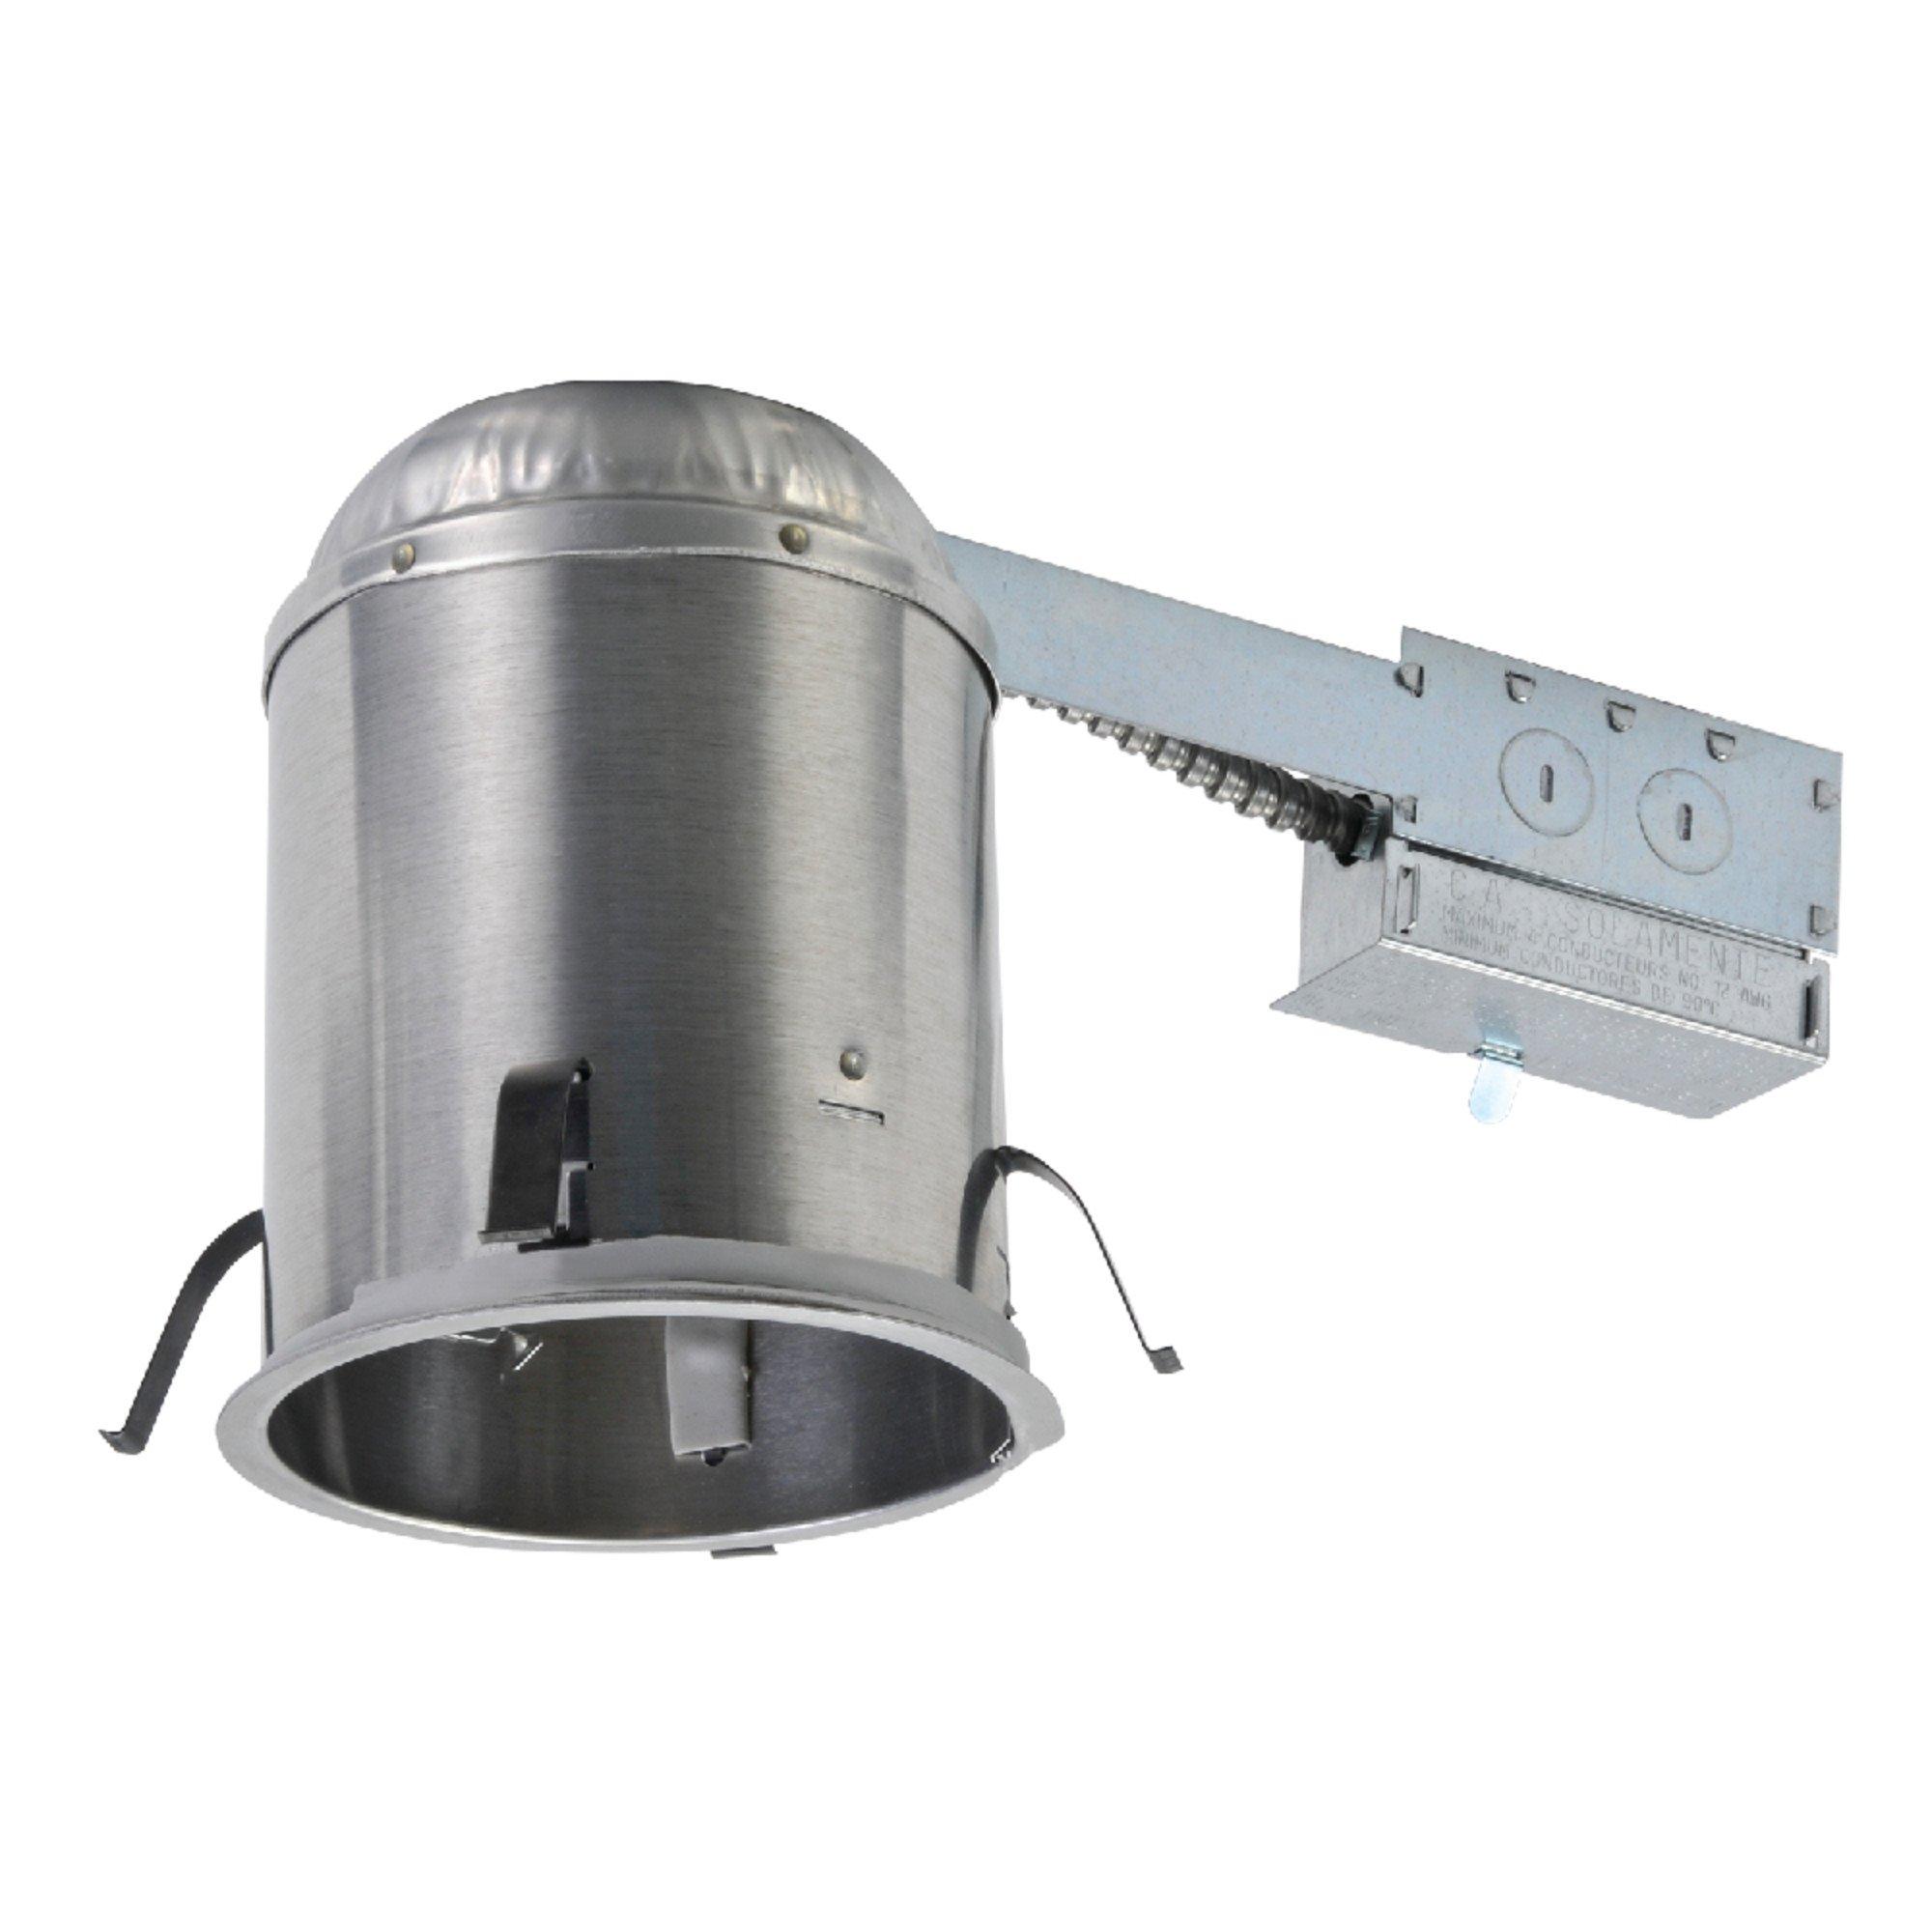 Halo H5RICAT Recessed Lighting Remodel IC Air-Tite Housing, 5 In, Aluminum